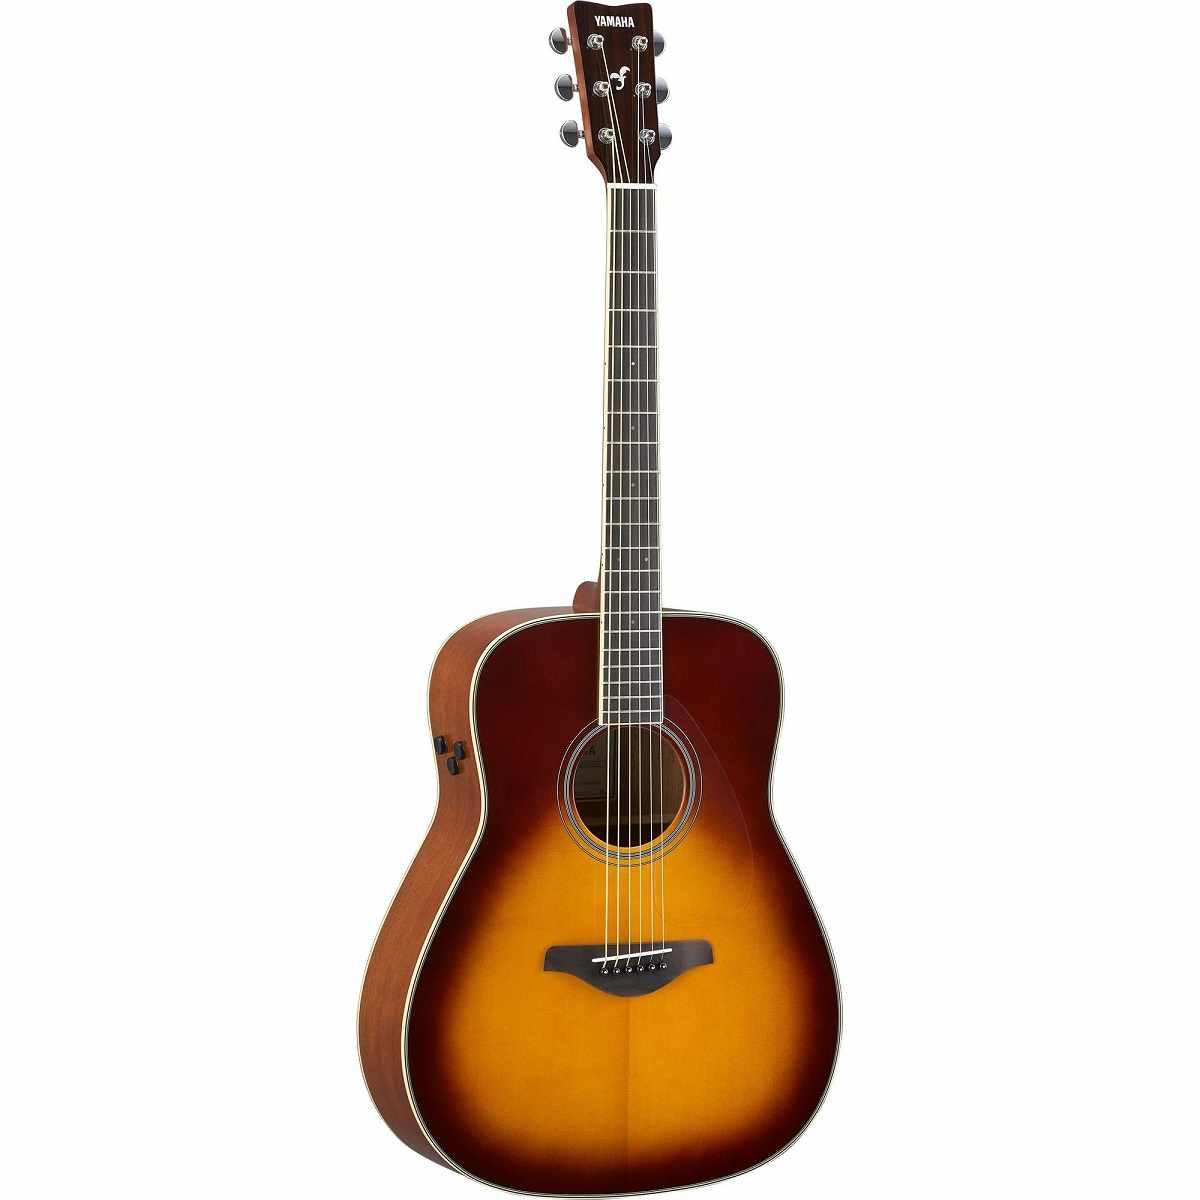 Violão TransAcoustic Western Tradicional Aço FG-TA Brown Sunburst Yamaha